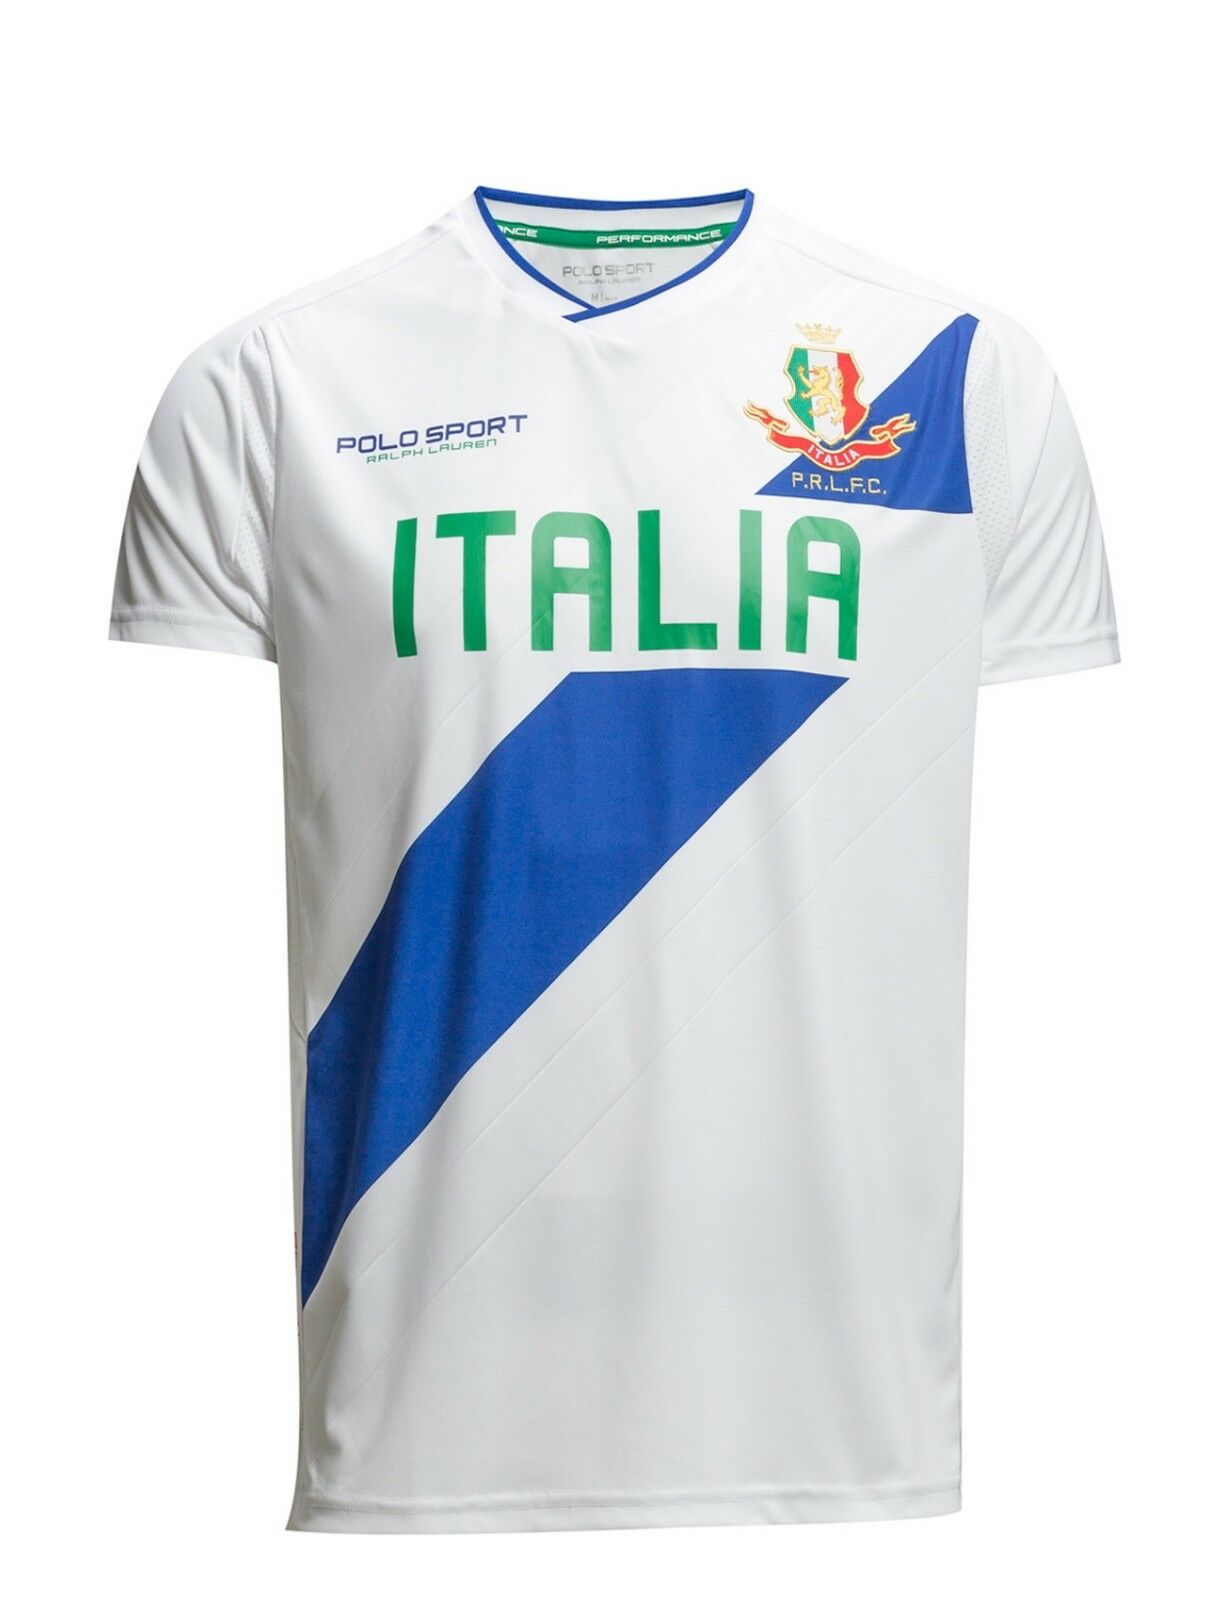 Polo Sport Ralph Lauren Italia Jersey T-Shirt Small NWT